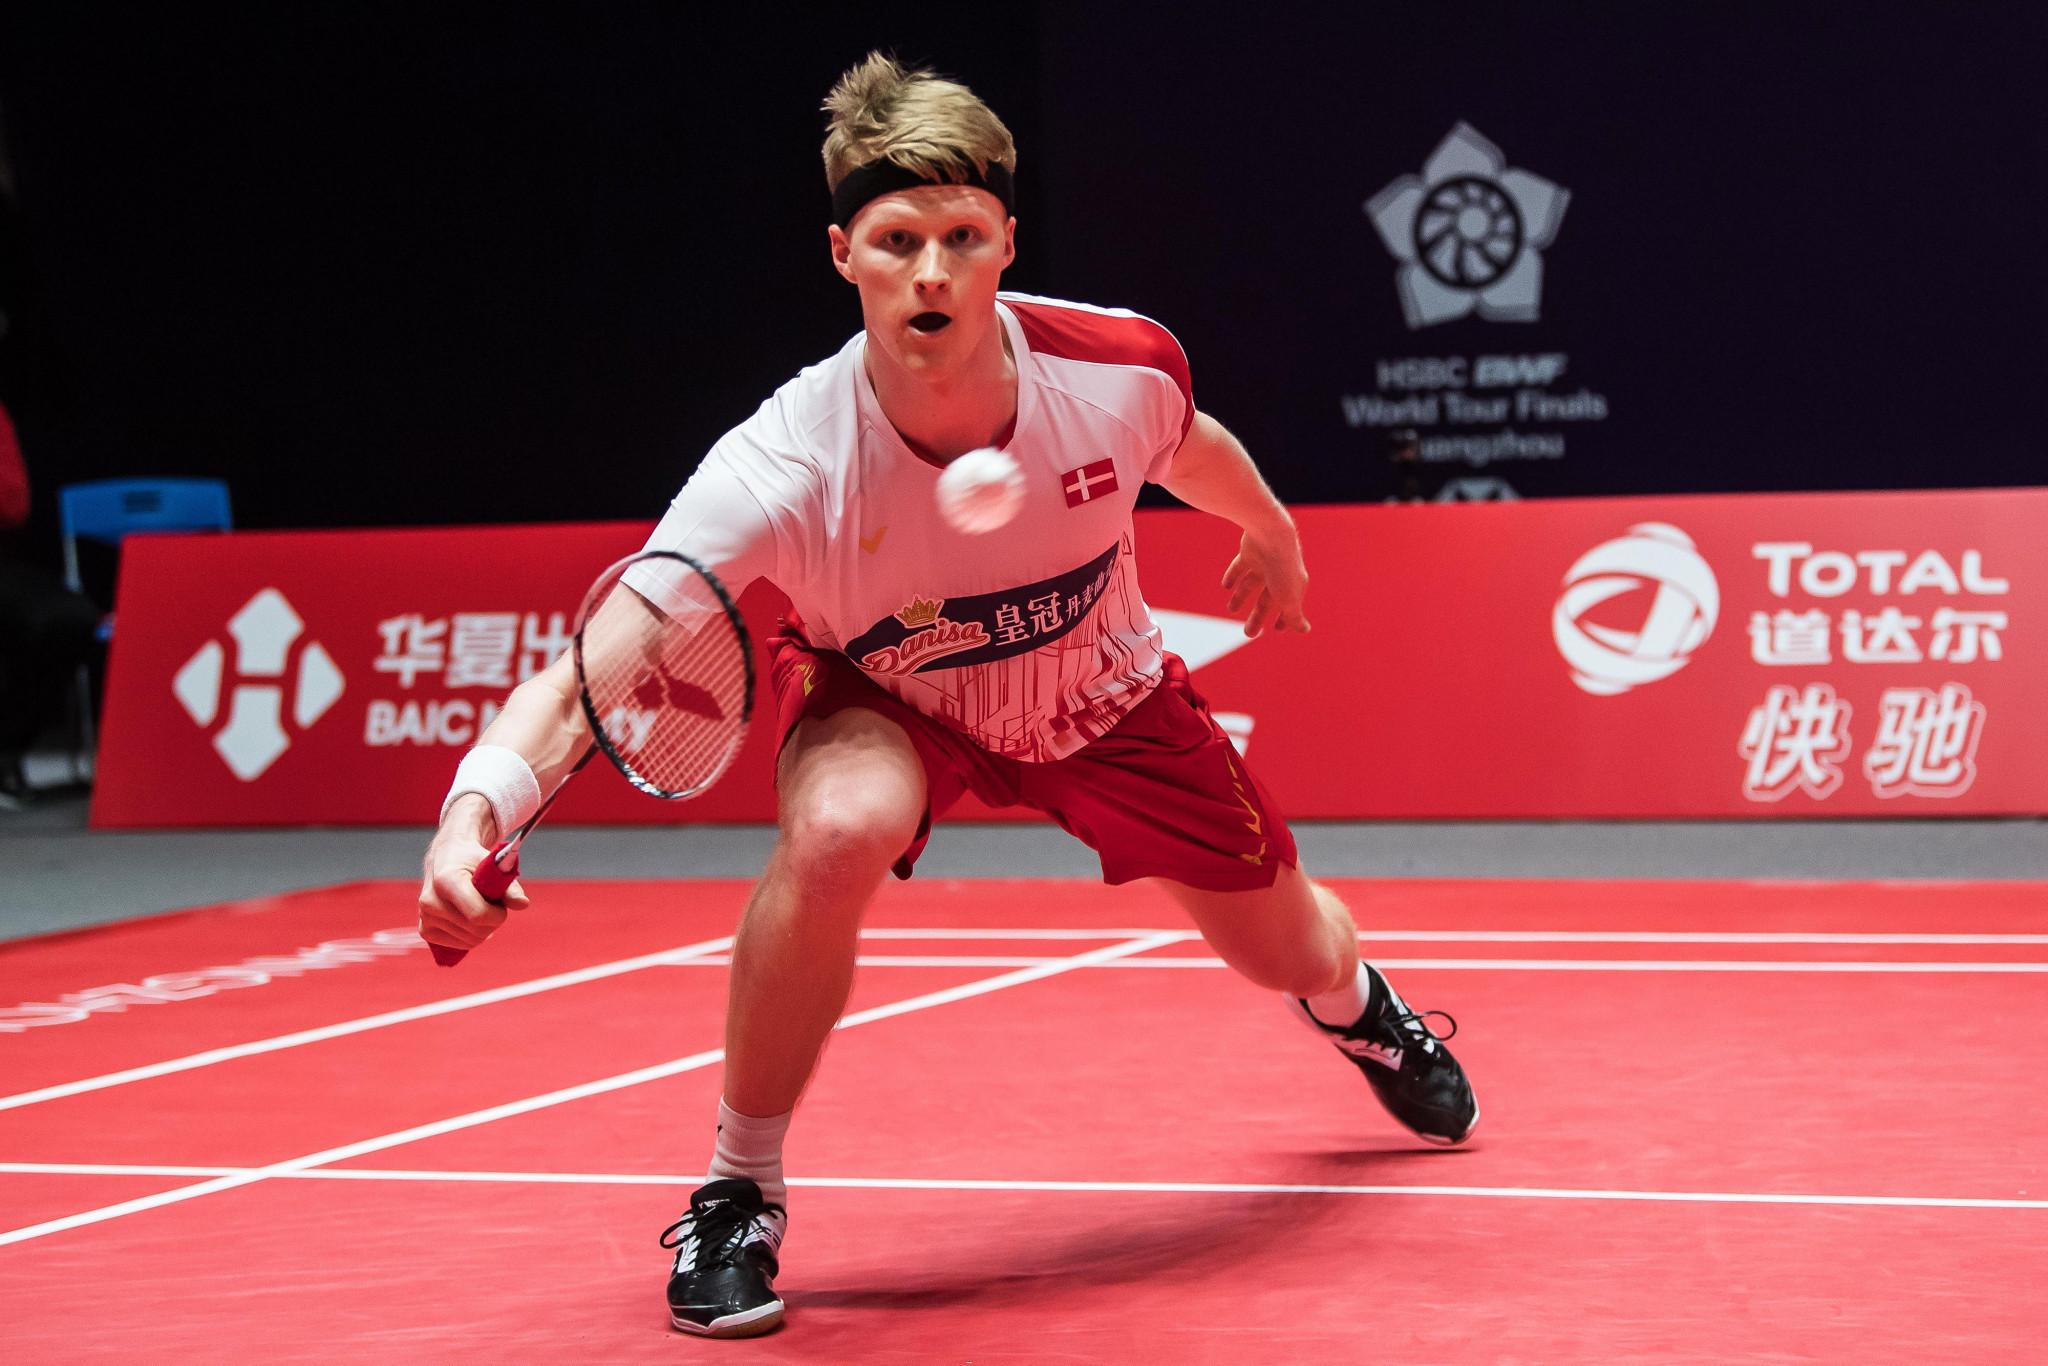 Danish men look to remain unbeaten at European Team Badminton Championships